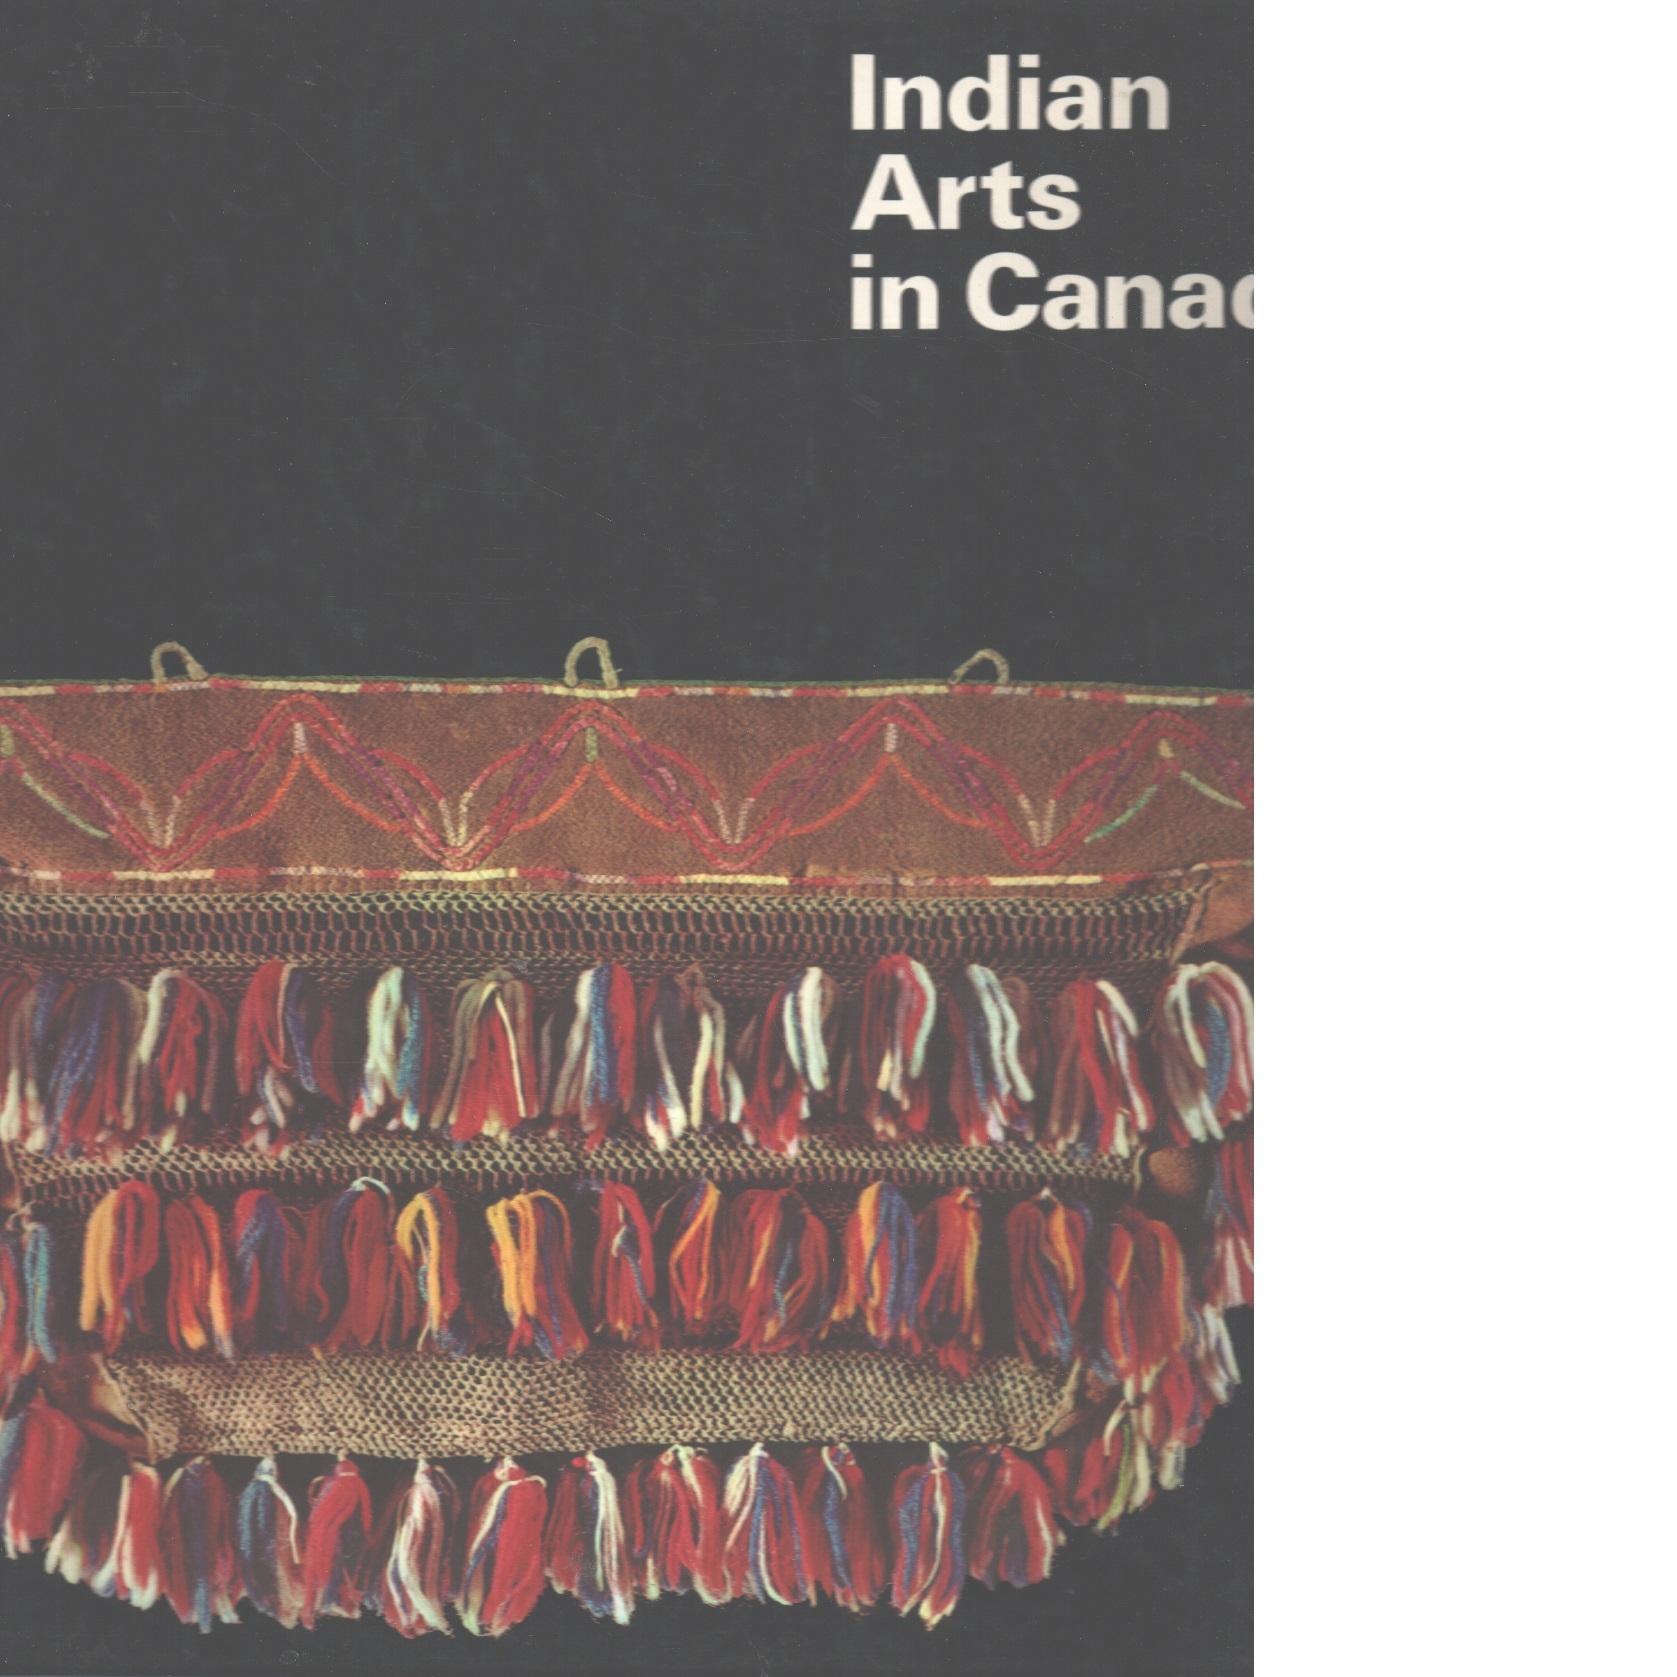 Indian arts in Canada - Gottschalk,  Fritz  And   Stutz, Magrit